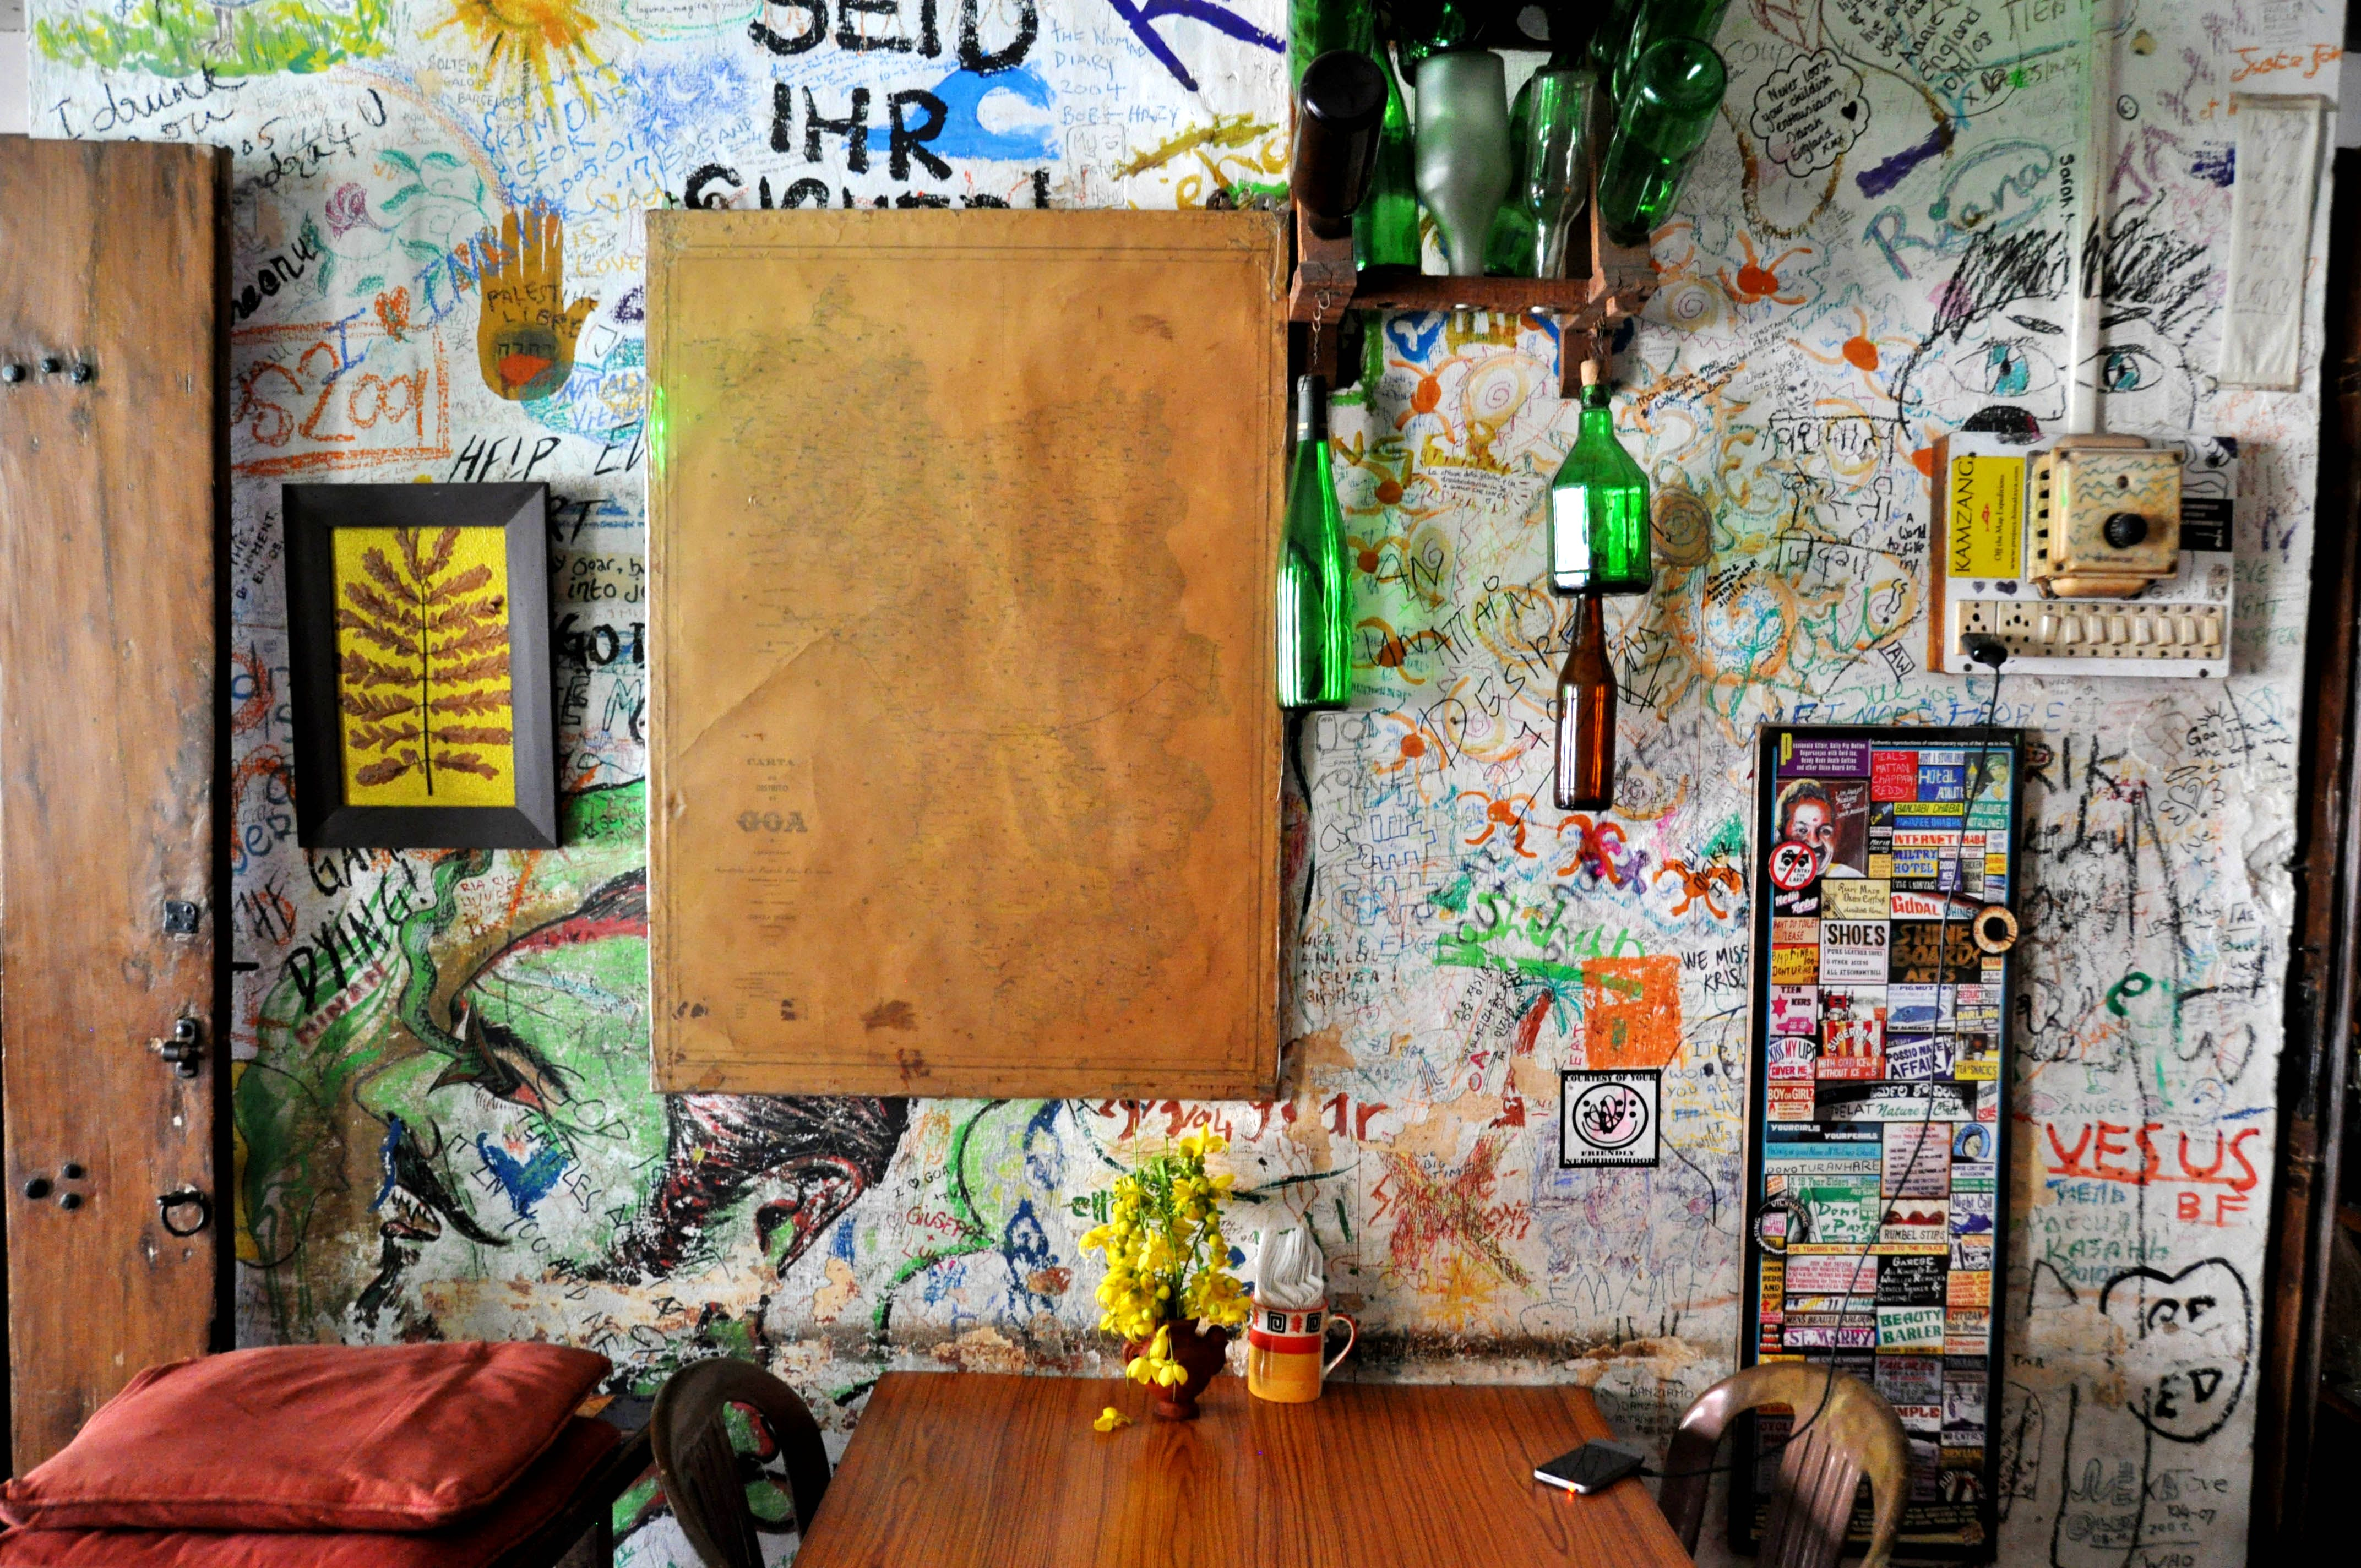 Wall,Room,Tree,Door,Art,Wood,Window,Still life,Painting,Paint